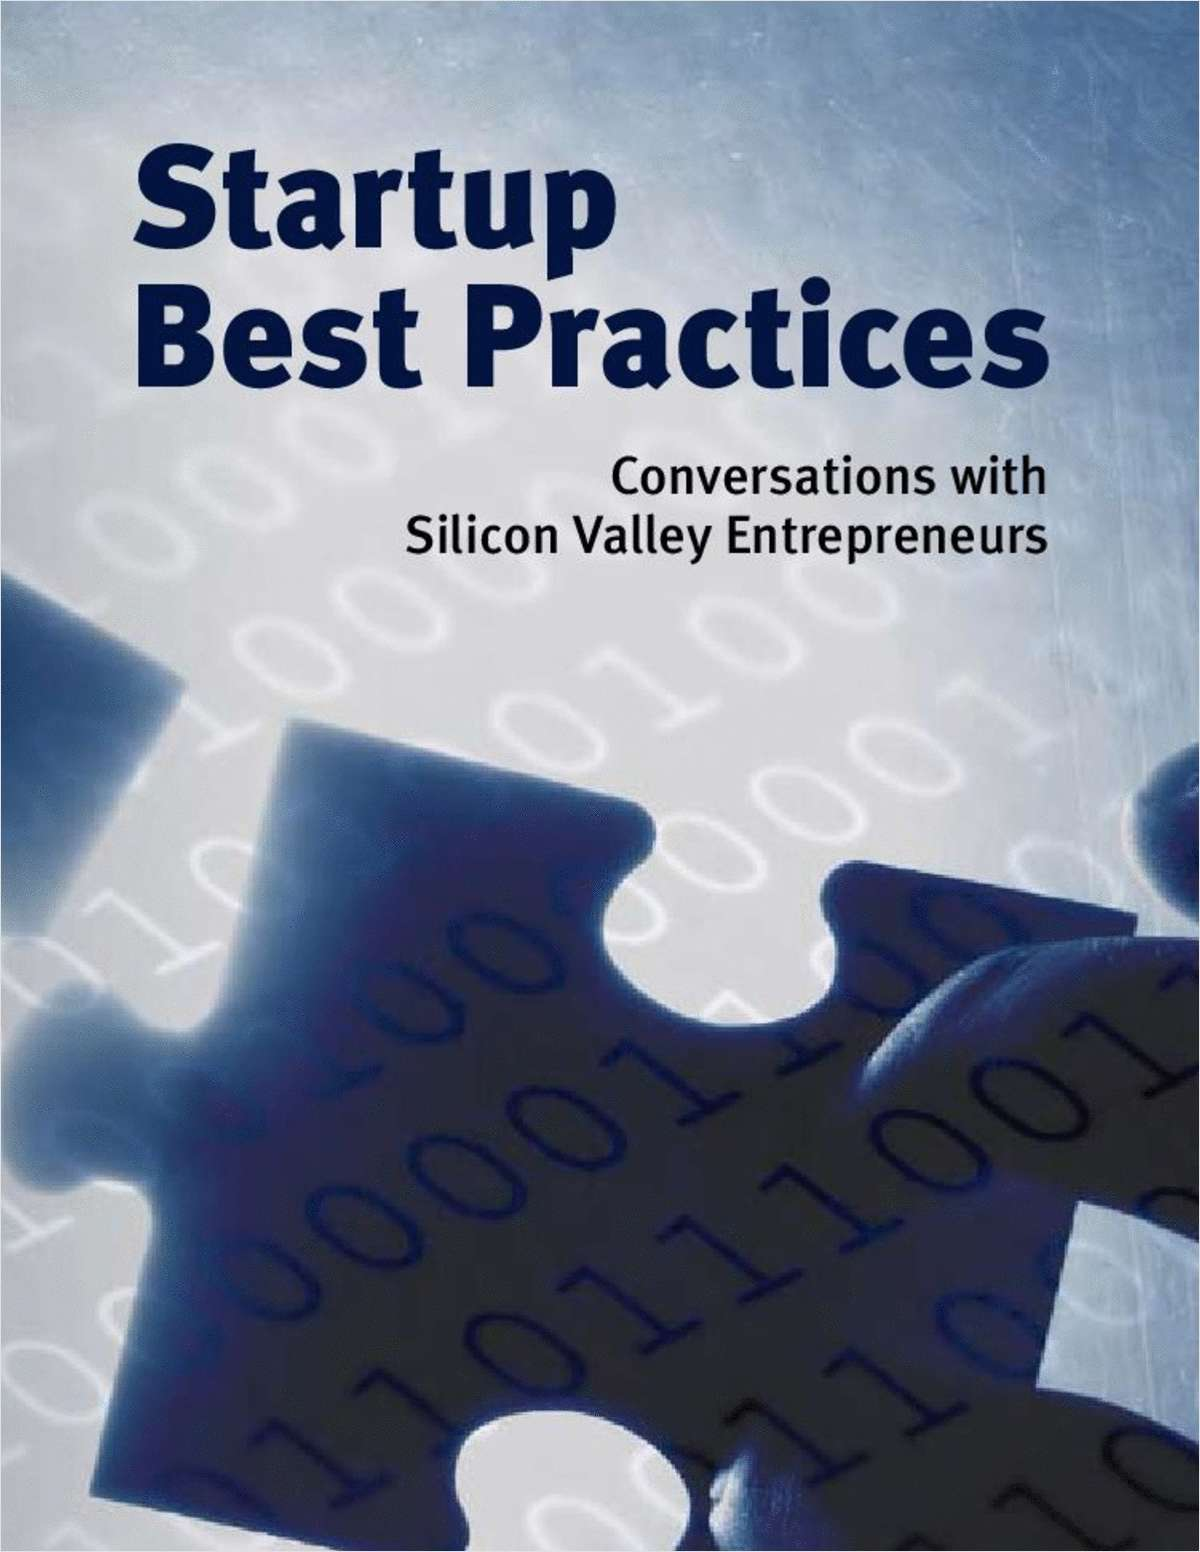 Startup Best Practices from 15 Serial Entrepreneurs